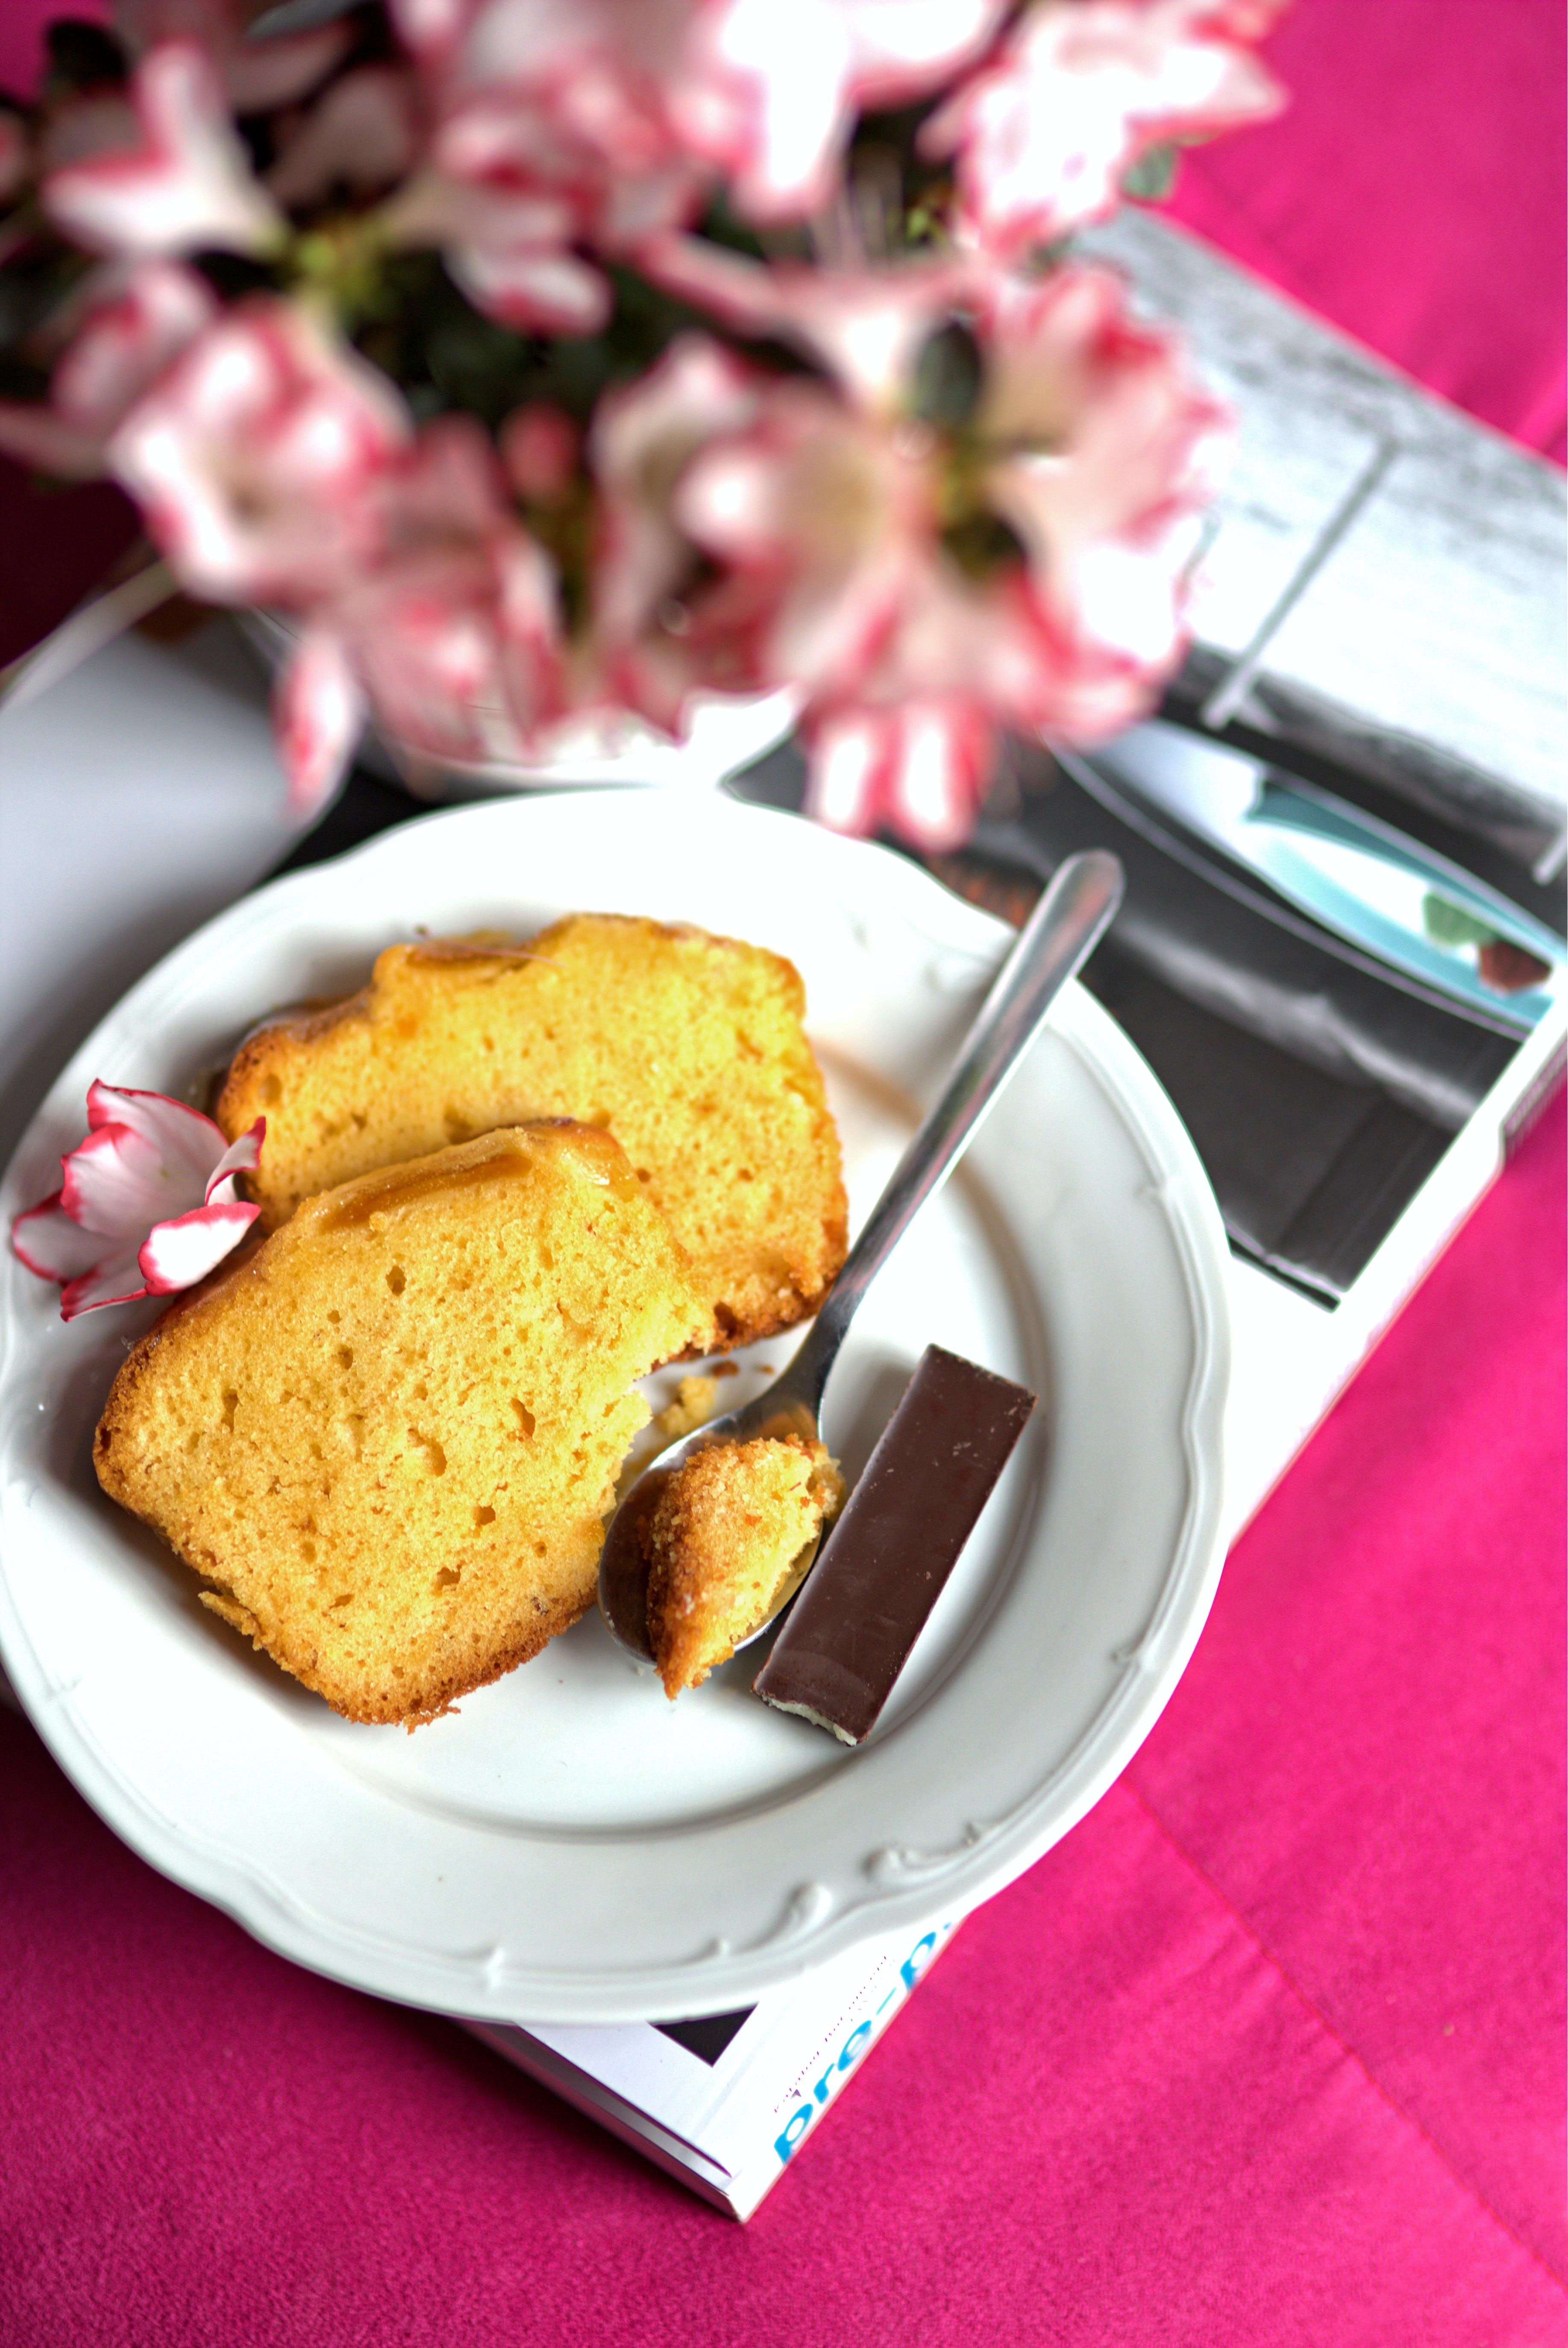 Fotos de stock gratuitas de azúcar, comida, delicioso, descanso